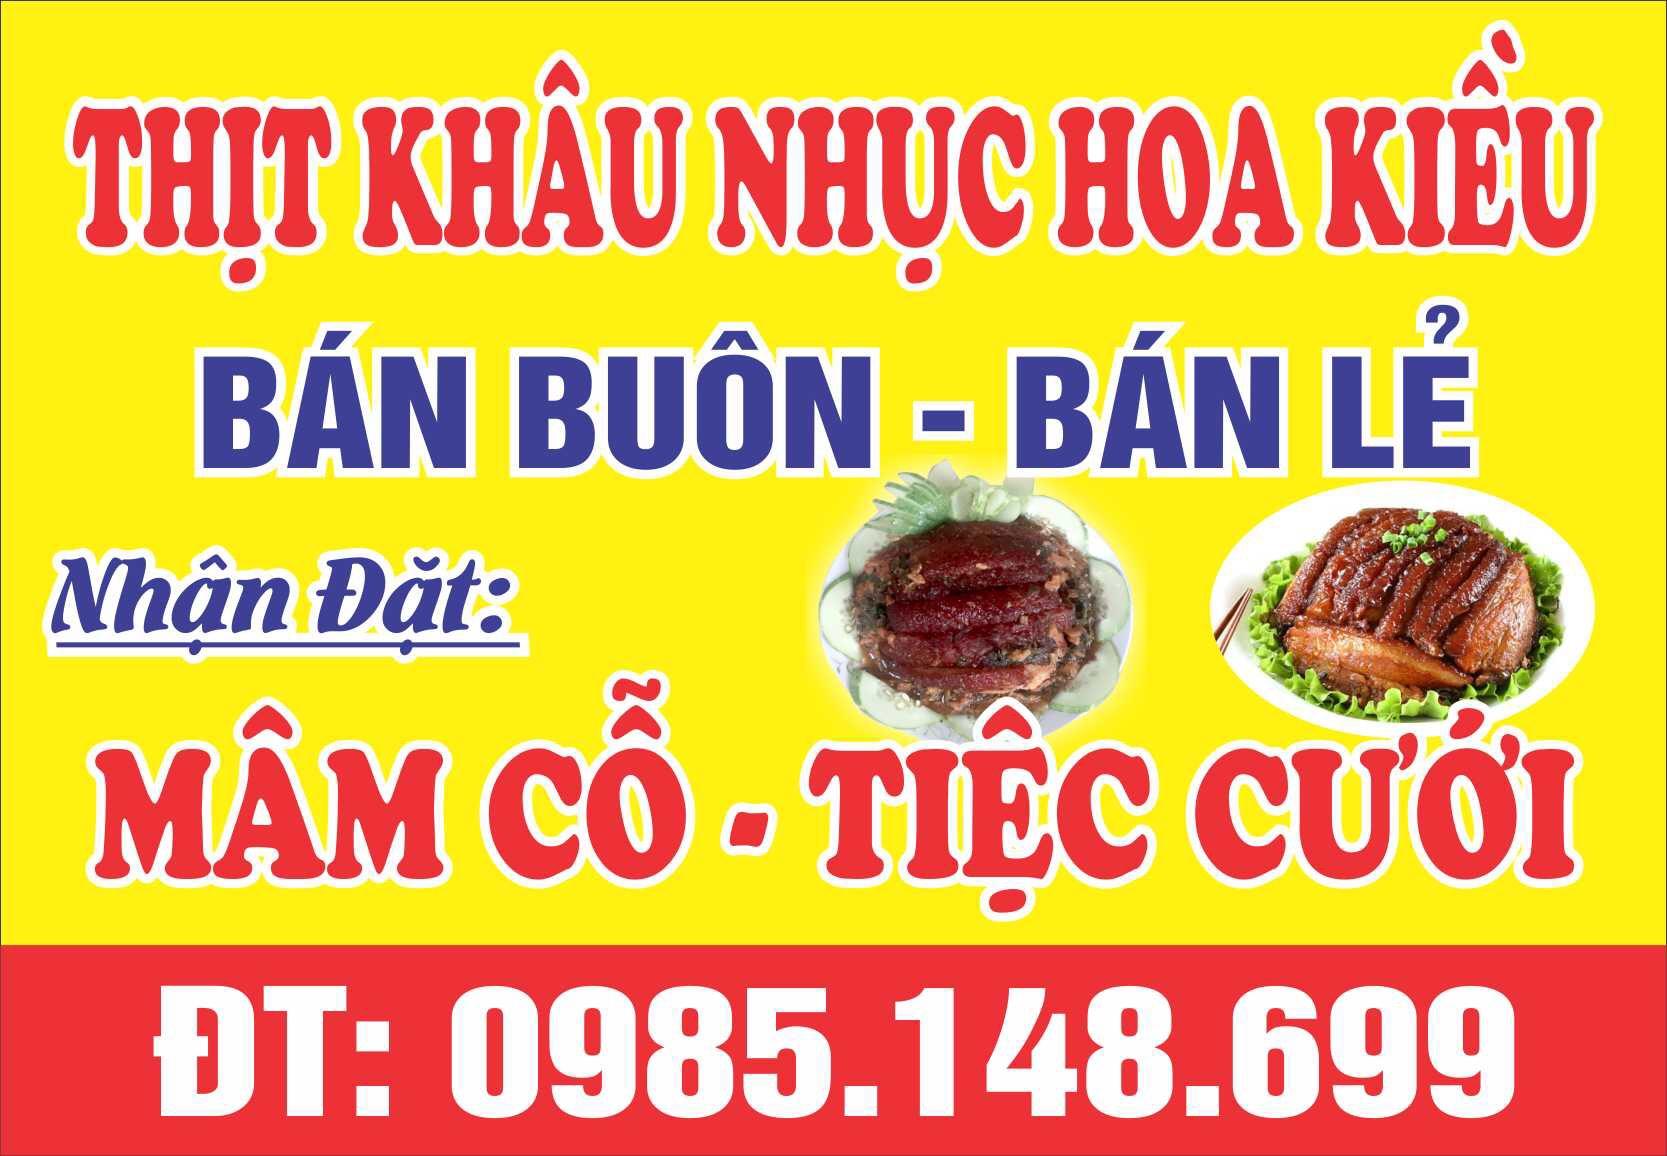 Khau Nhục - Kiều Anh Cẩm Phả